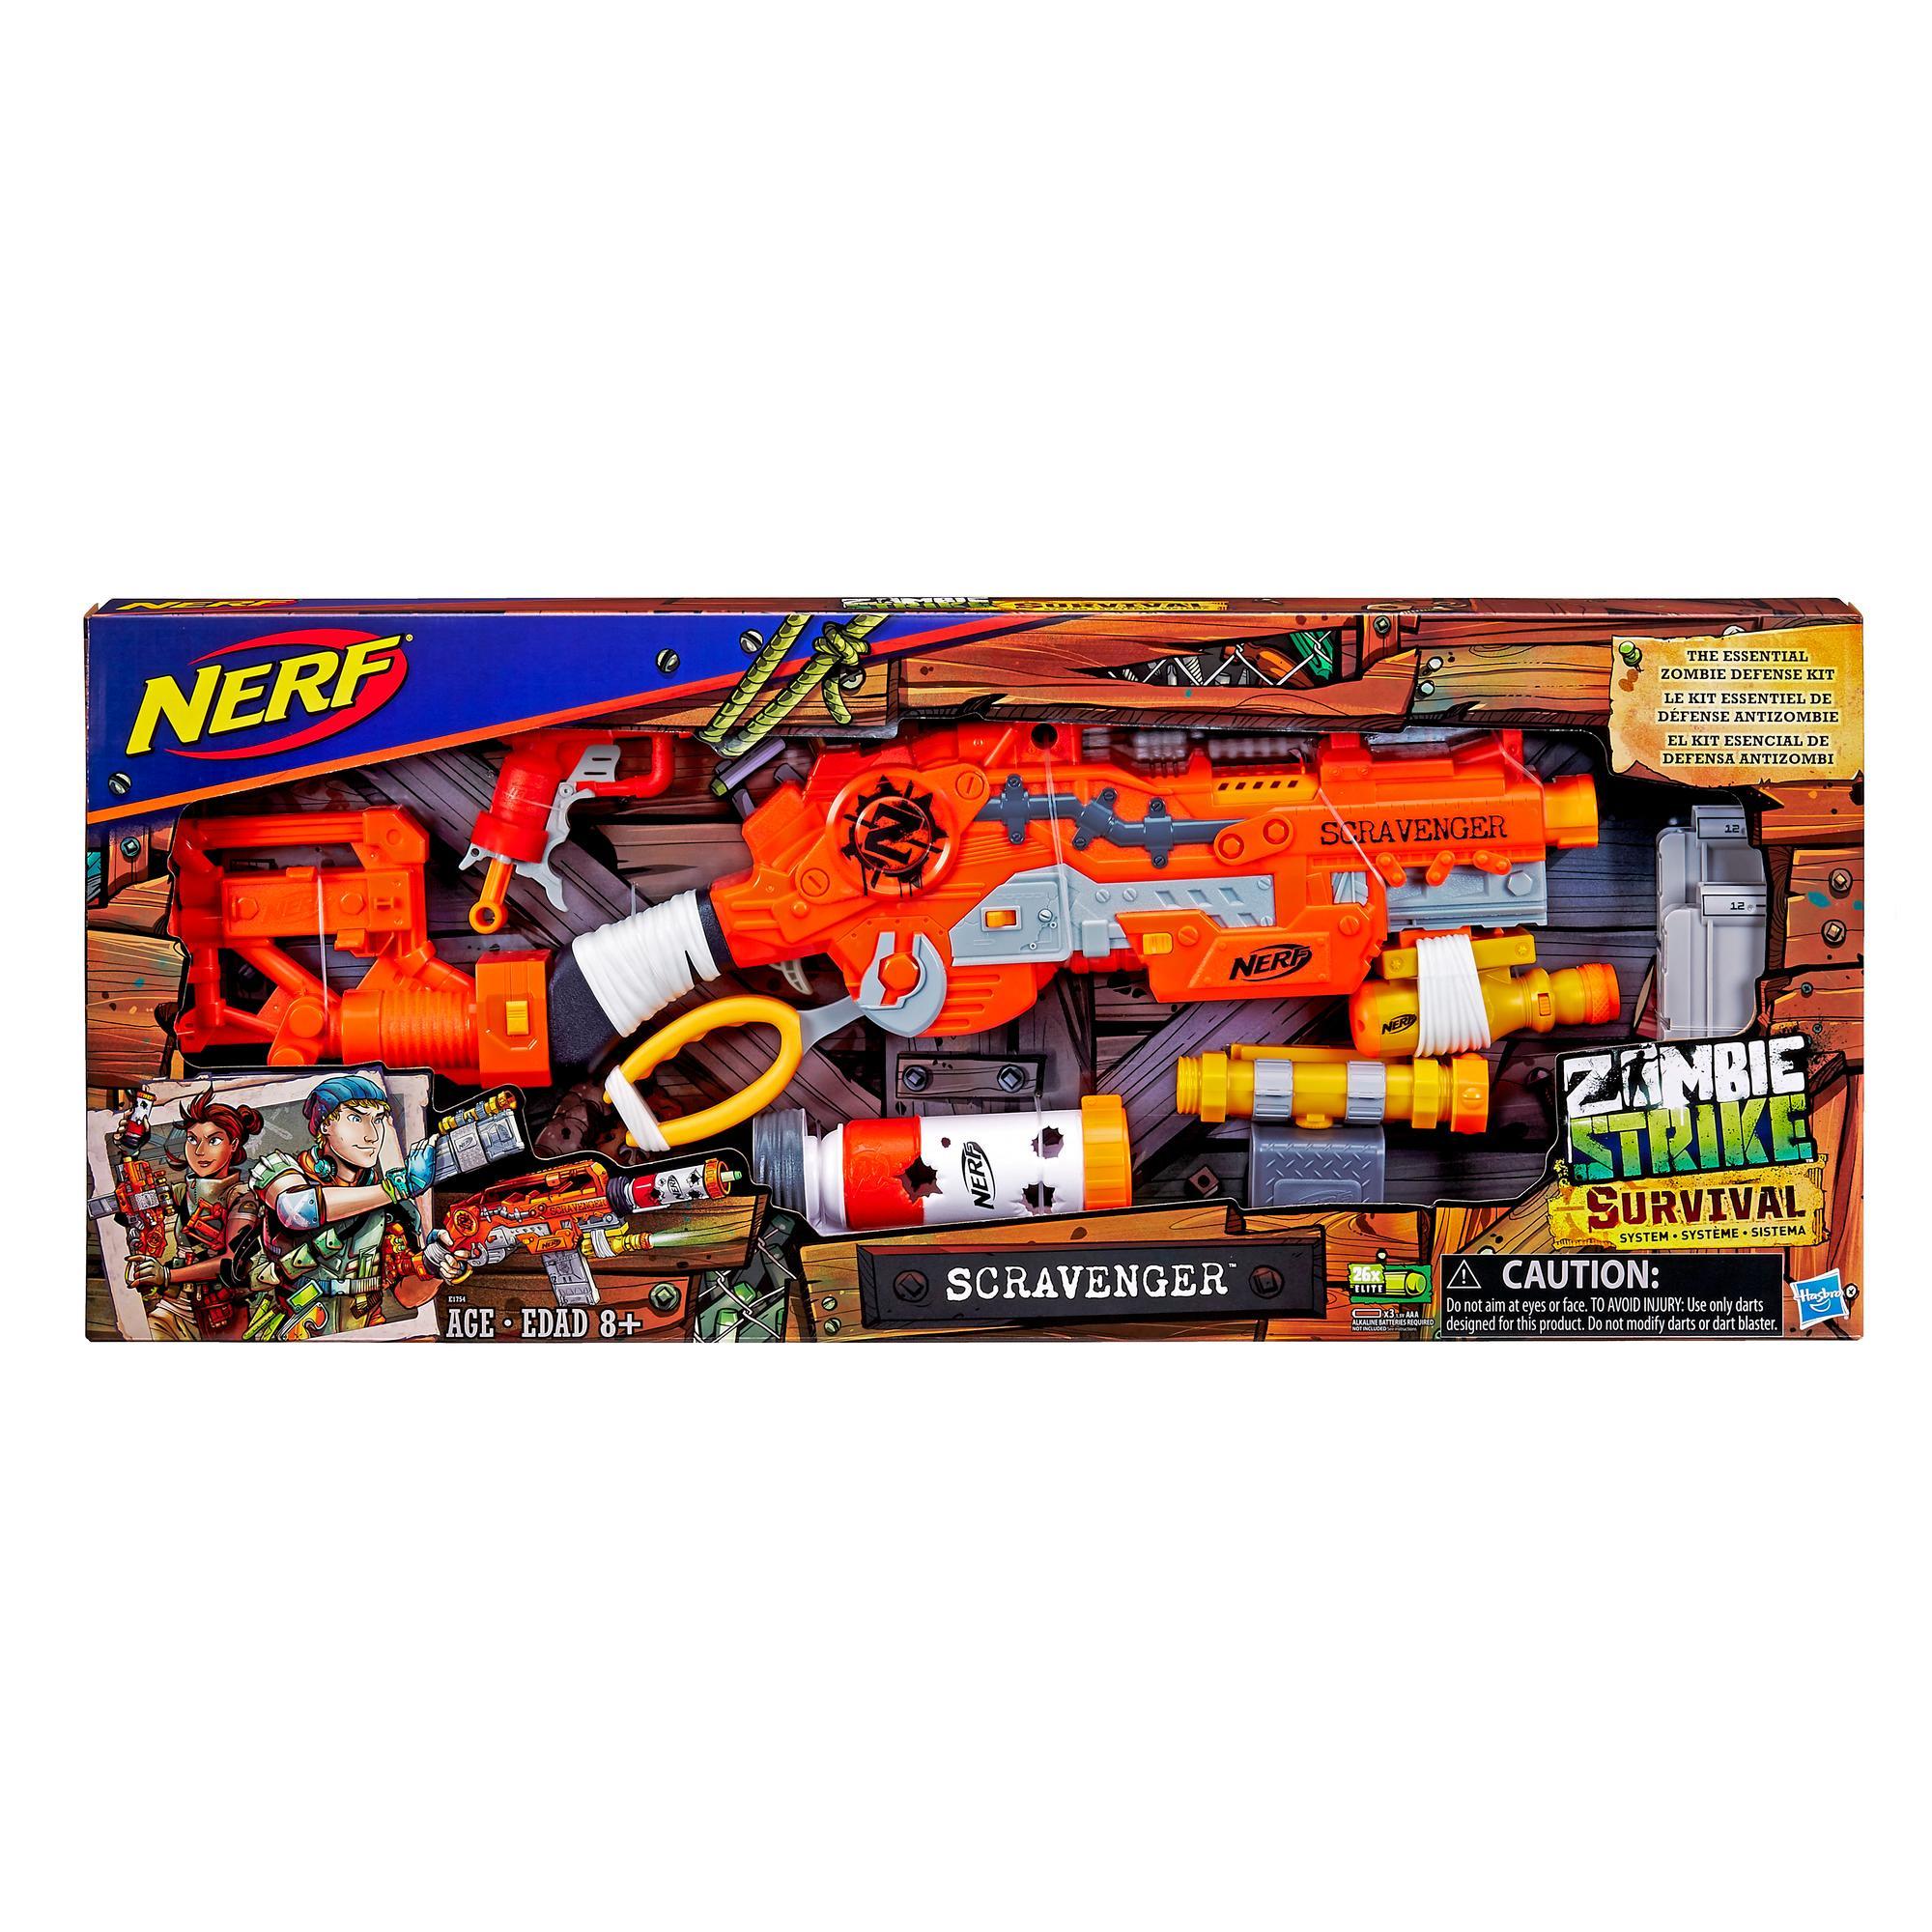 Nerf Zombie Strike Survival System Scravenger